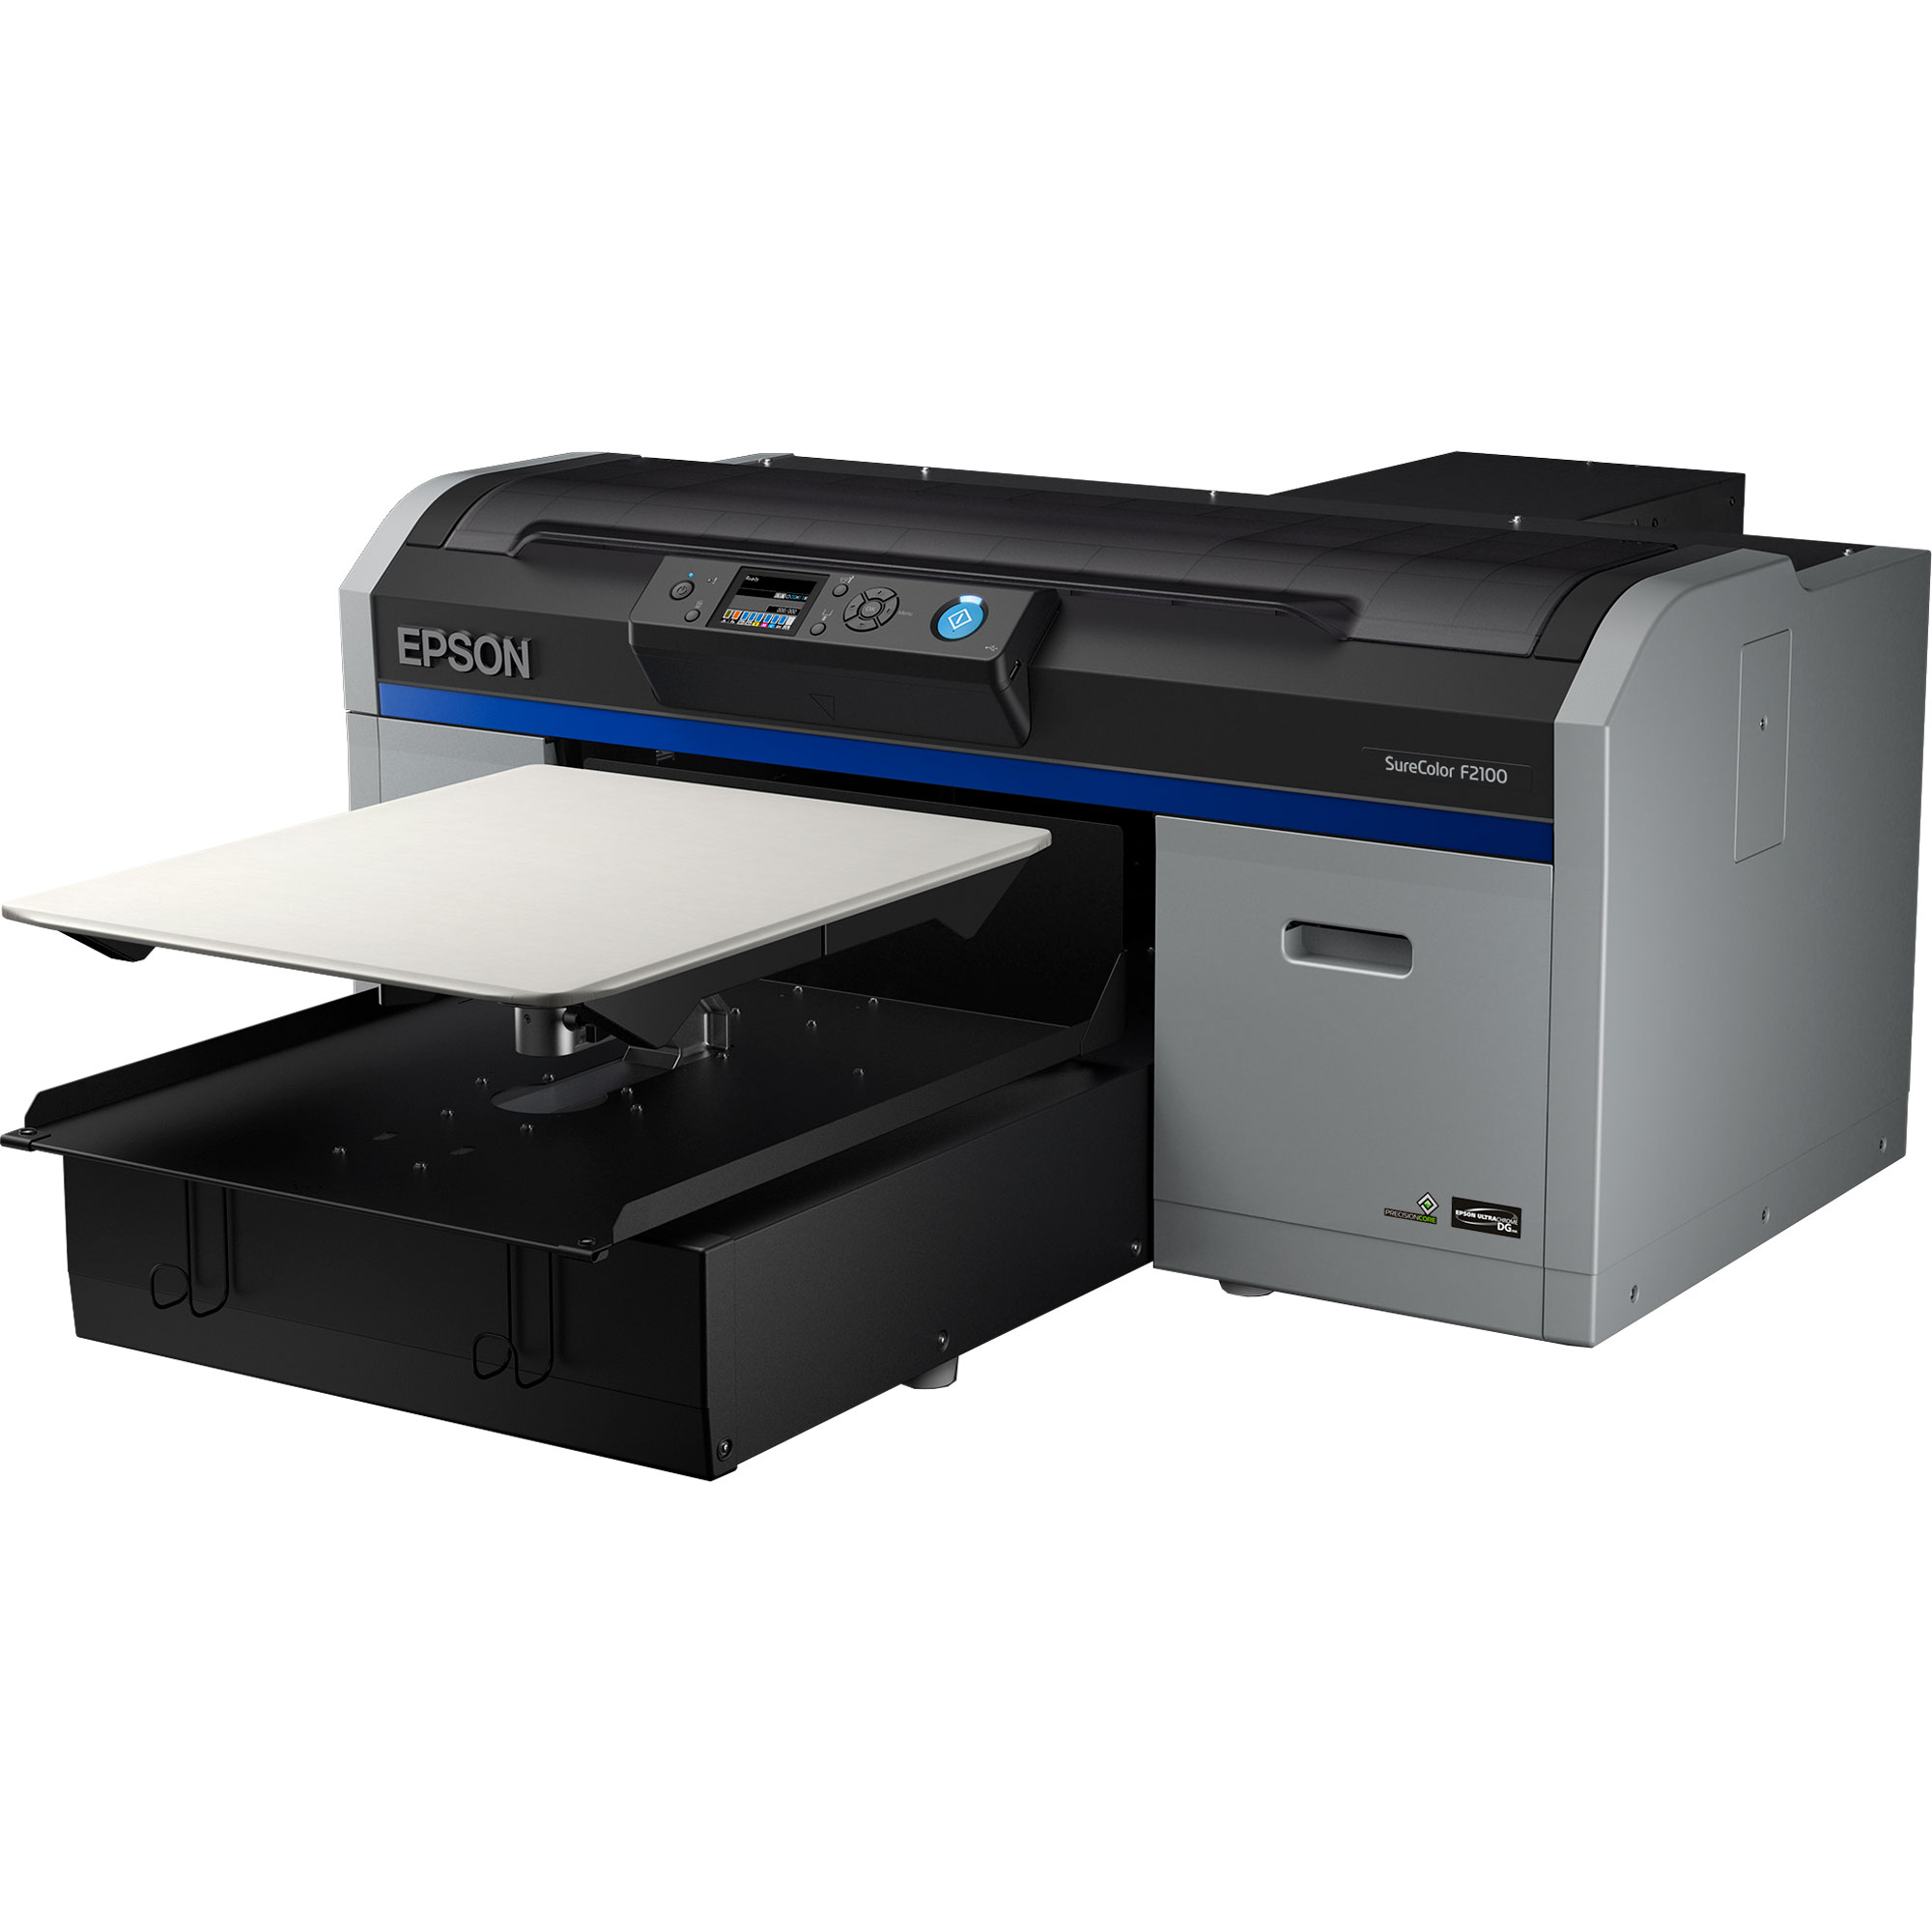 Epson SureColor F2100 Direct to Garment Printer | Buffalo